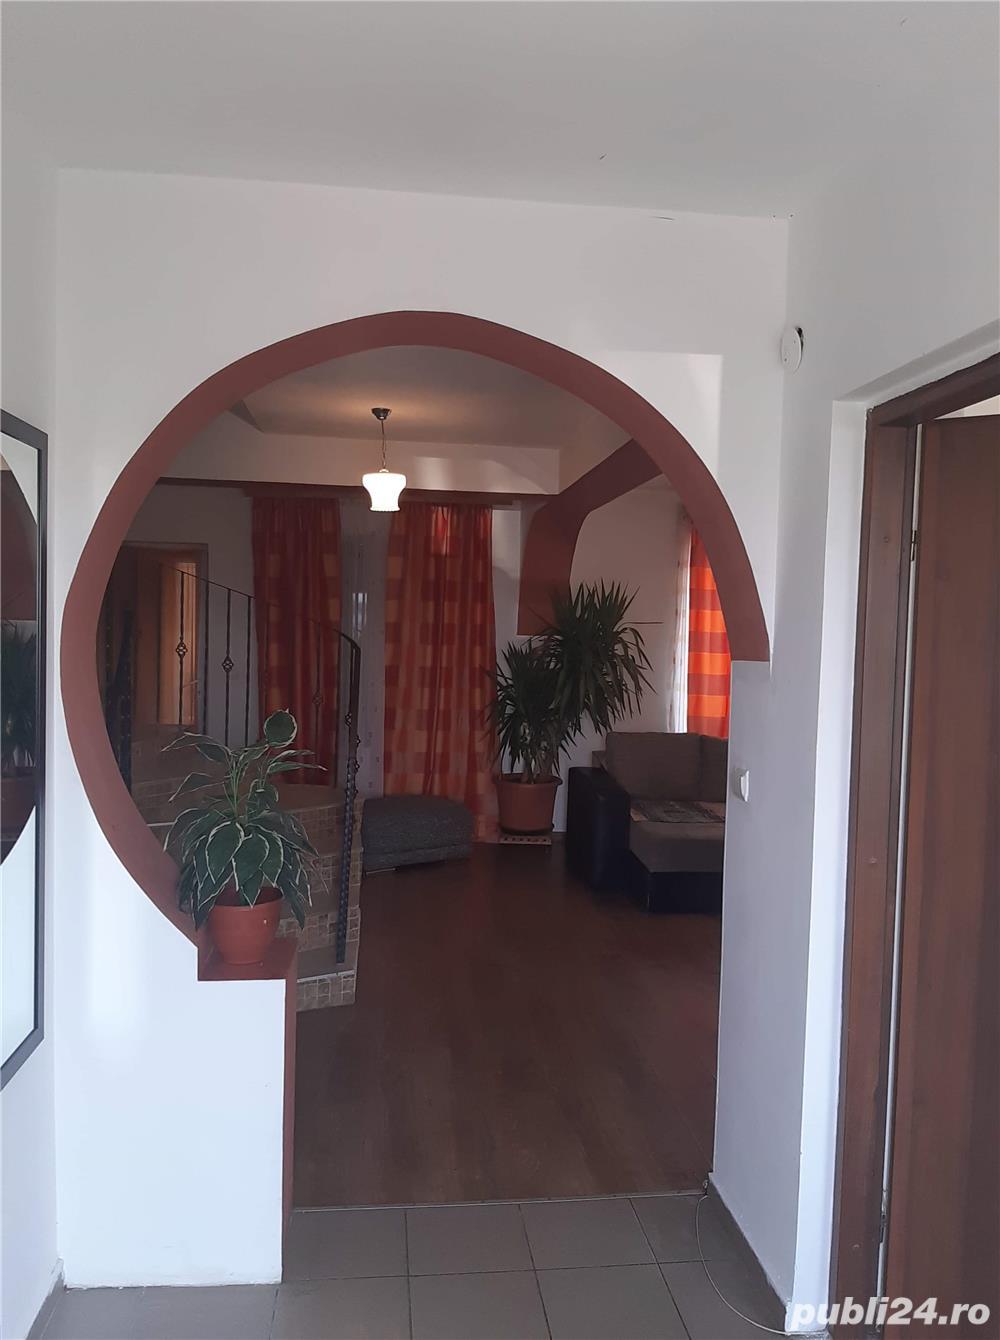 Cazare firme, evenimene casa cu etaj in regim hotelier